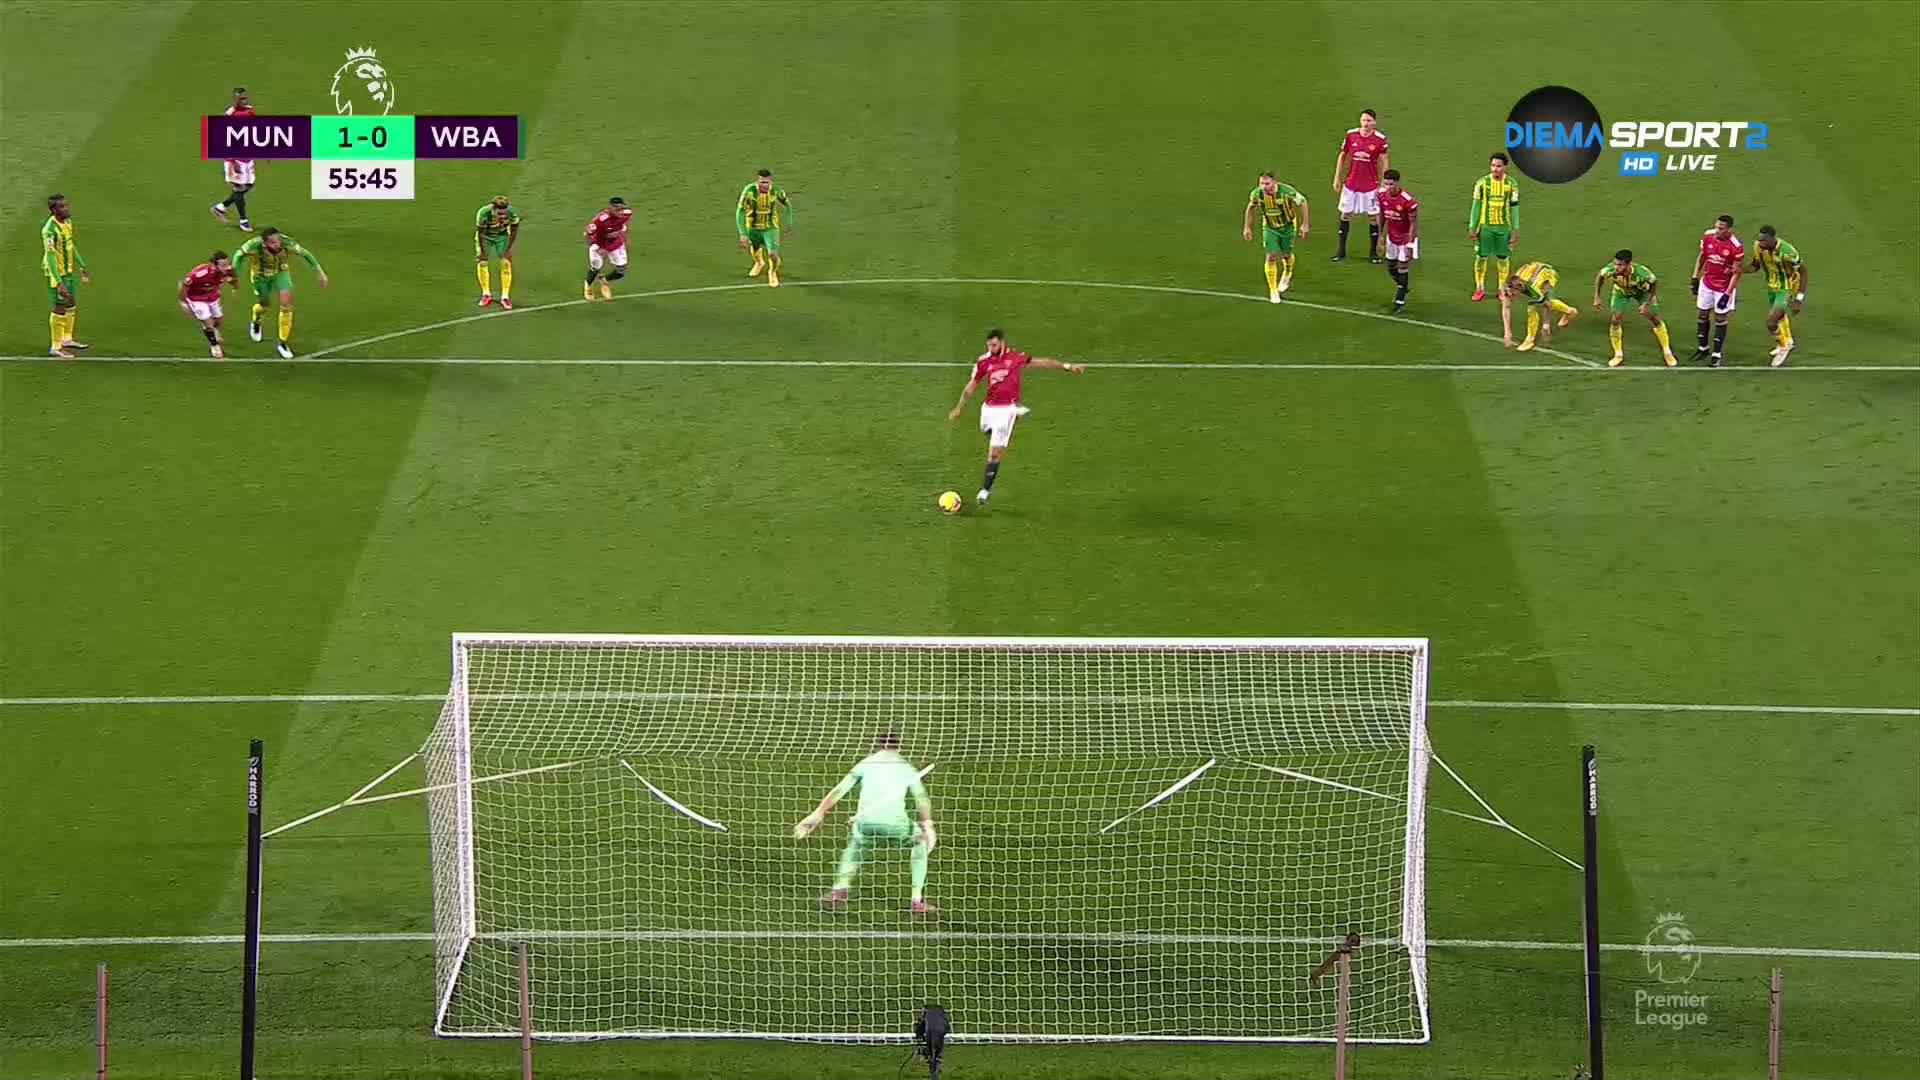 Манчестер Юнайтед - Уест Бромич Албиън 1:0 /репортаж/